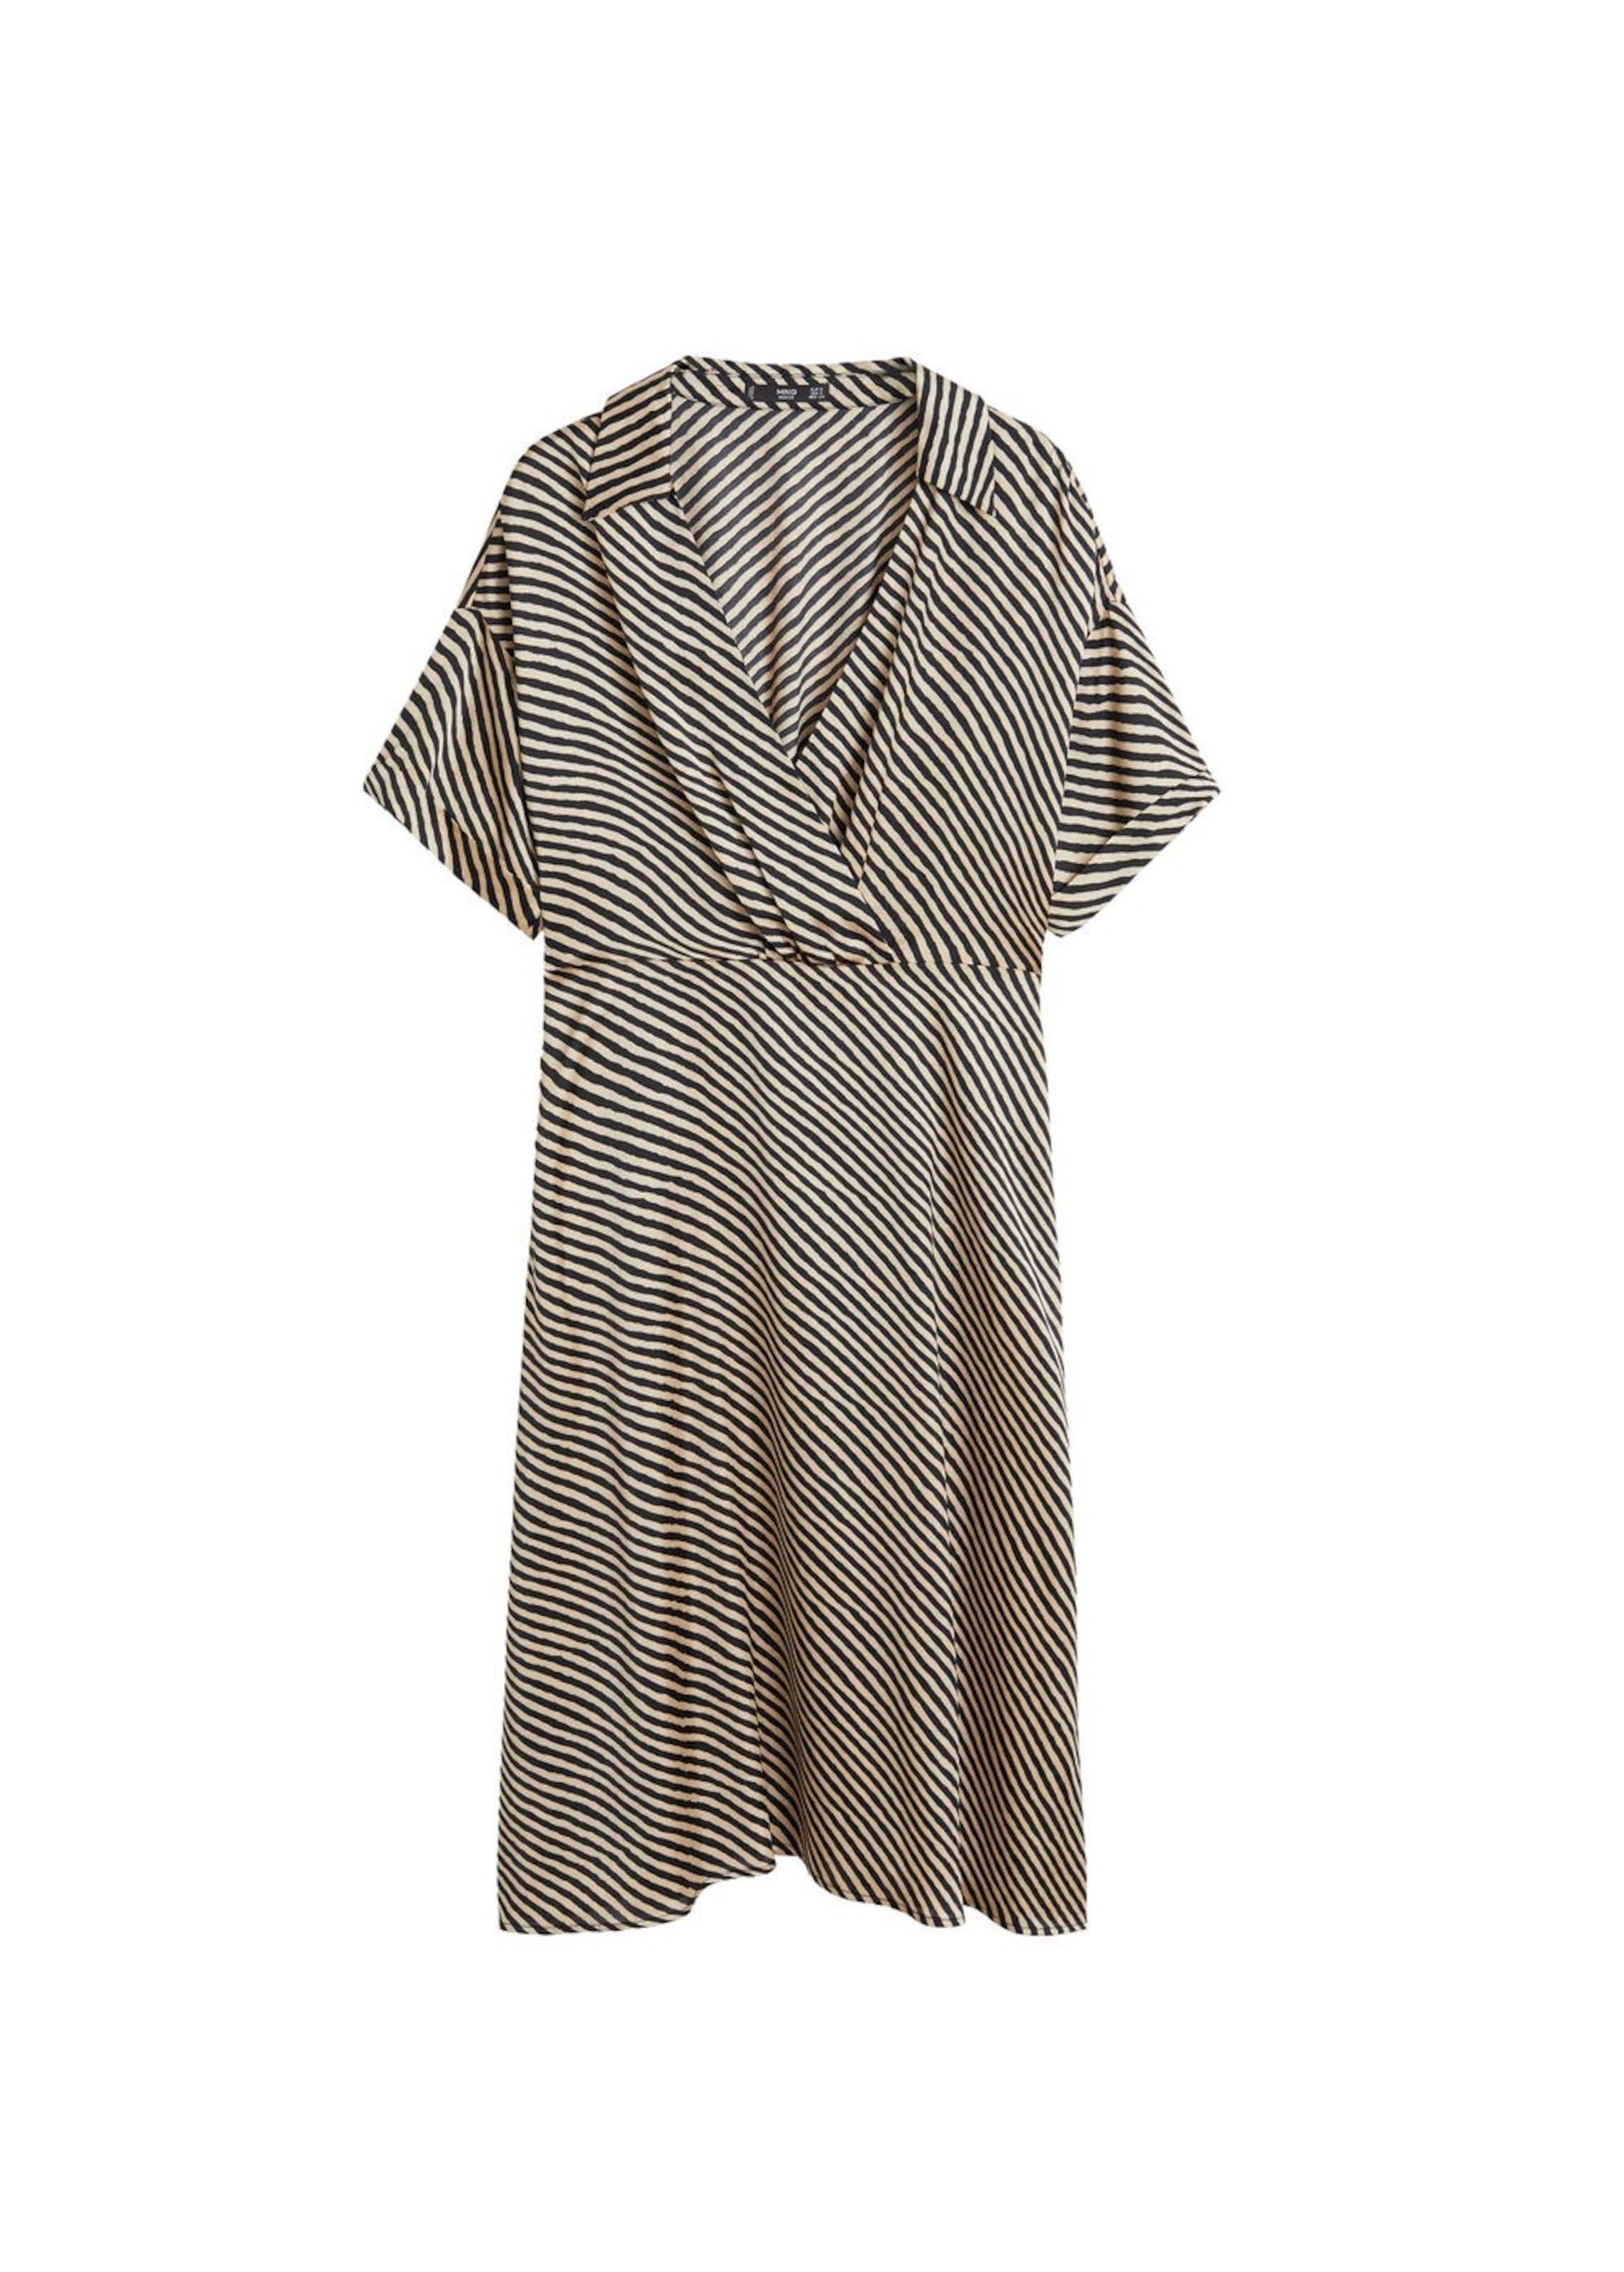 Mango 'mondrian' Kleid 'mondrian' 'mondrian' Mango Kleid Schwarz Mango In Schwarz Kleid In 0wnP8Ok